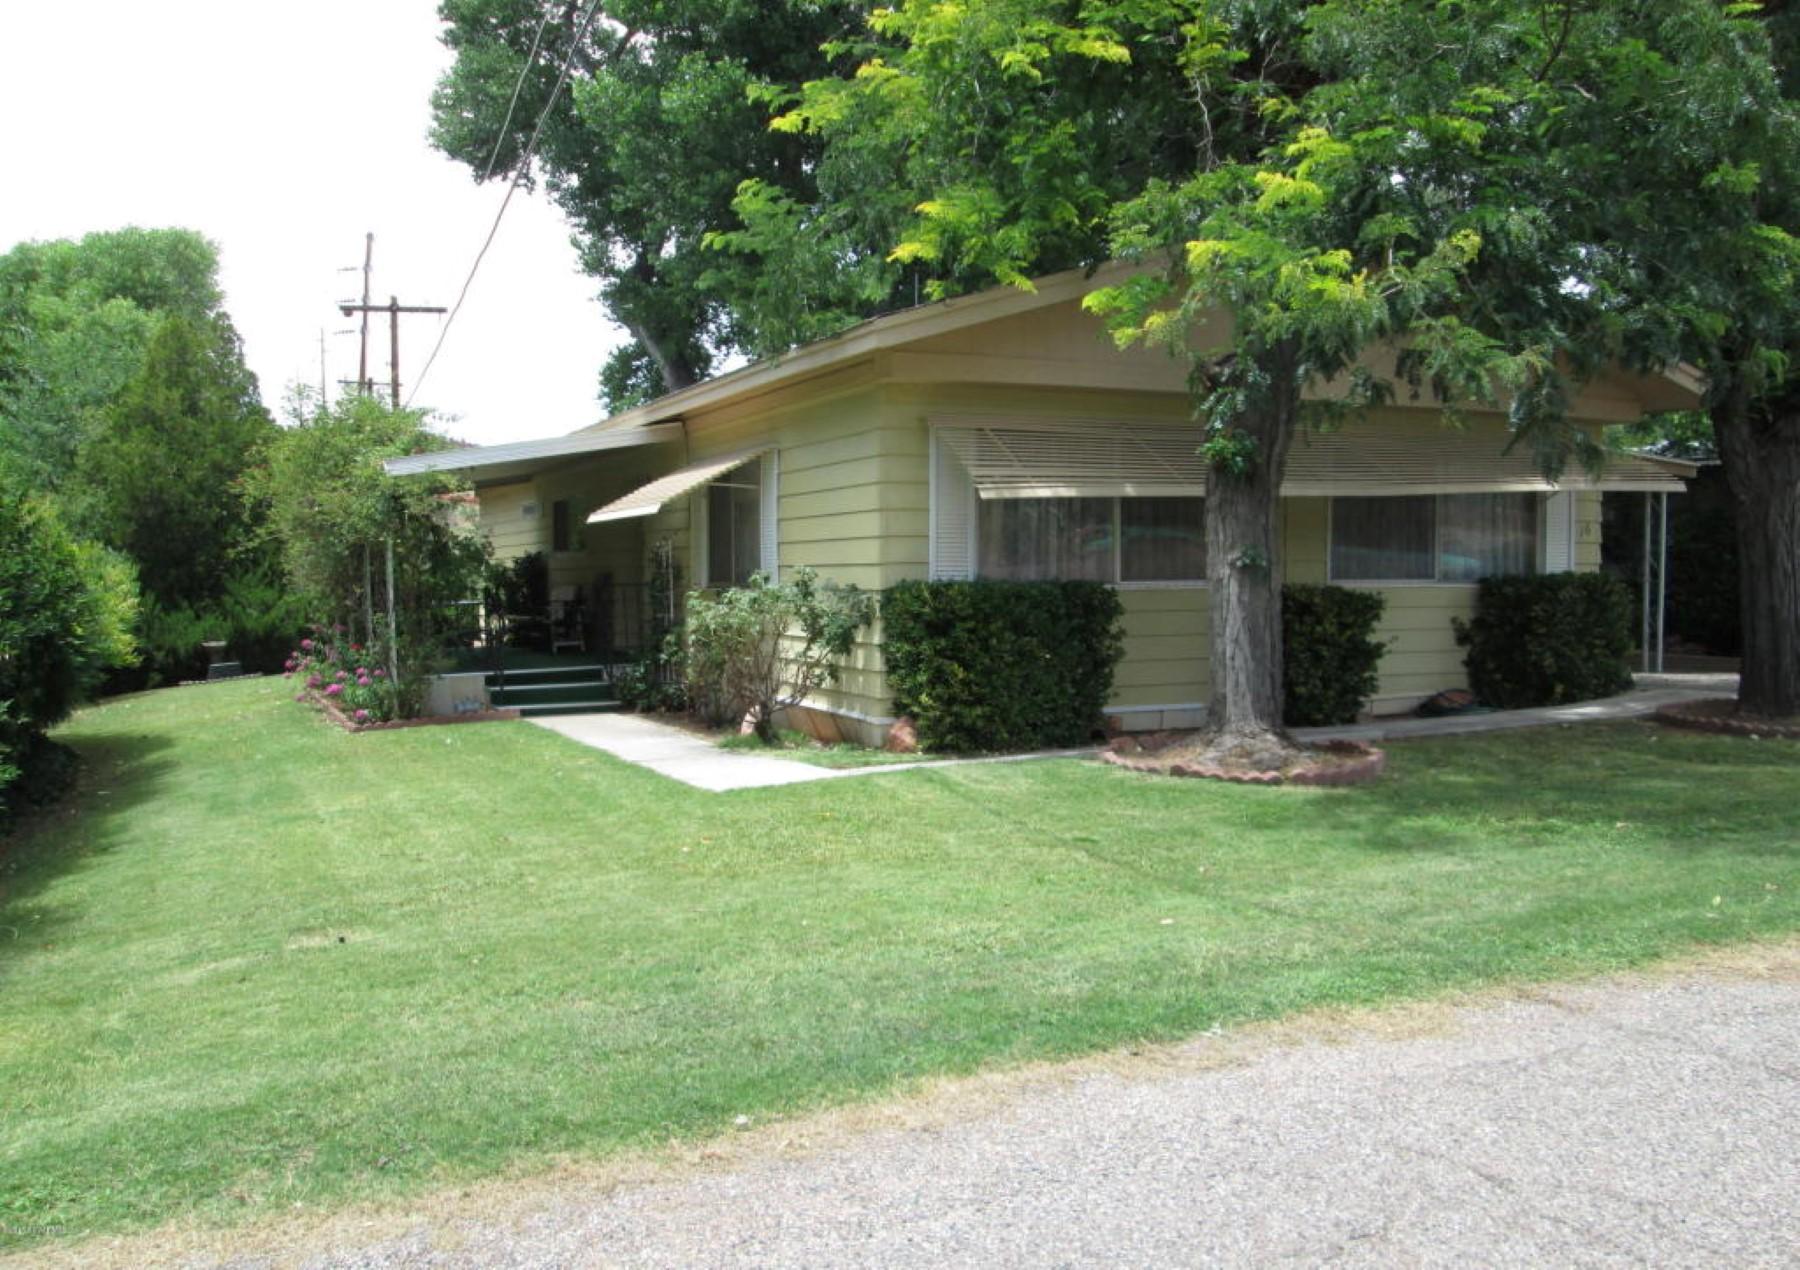 Moradia para Venda às Amazing opportunity to own a home in Sedona with creek access. 300 Red Rock Crossing Rd 16 Sedona, Arizona 86336 Estados Unidos